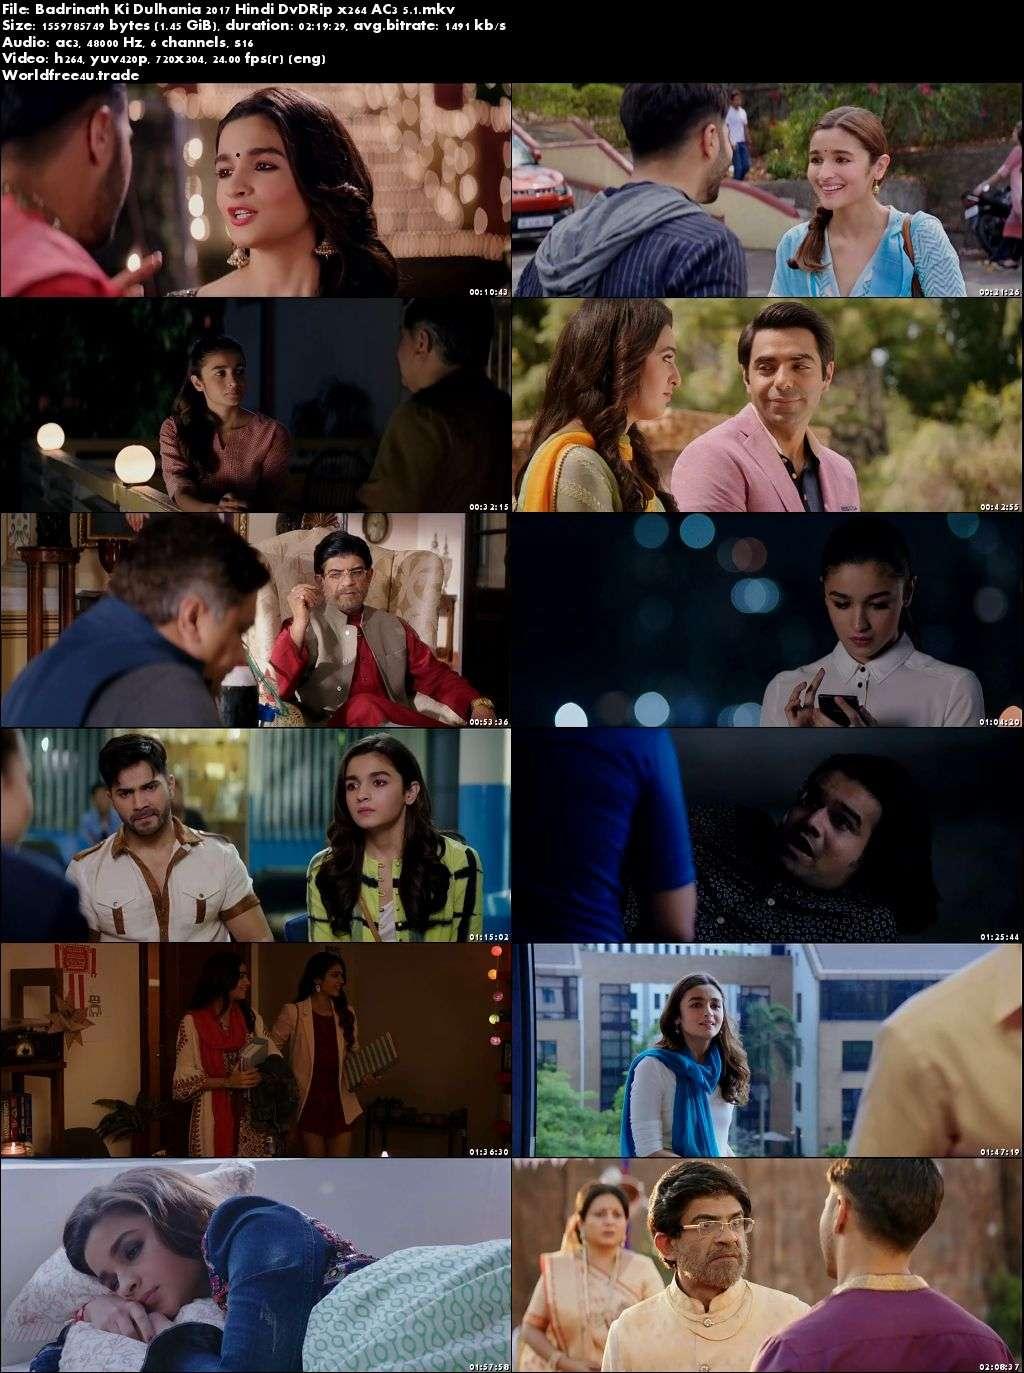 Screen Shots Badrinath Ki Dulhania (2017) Full HD Movie Download 720p